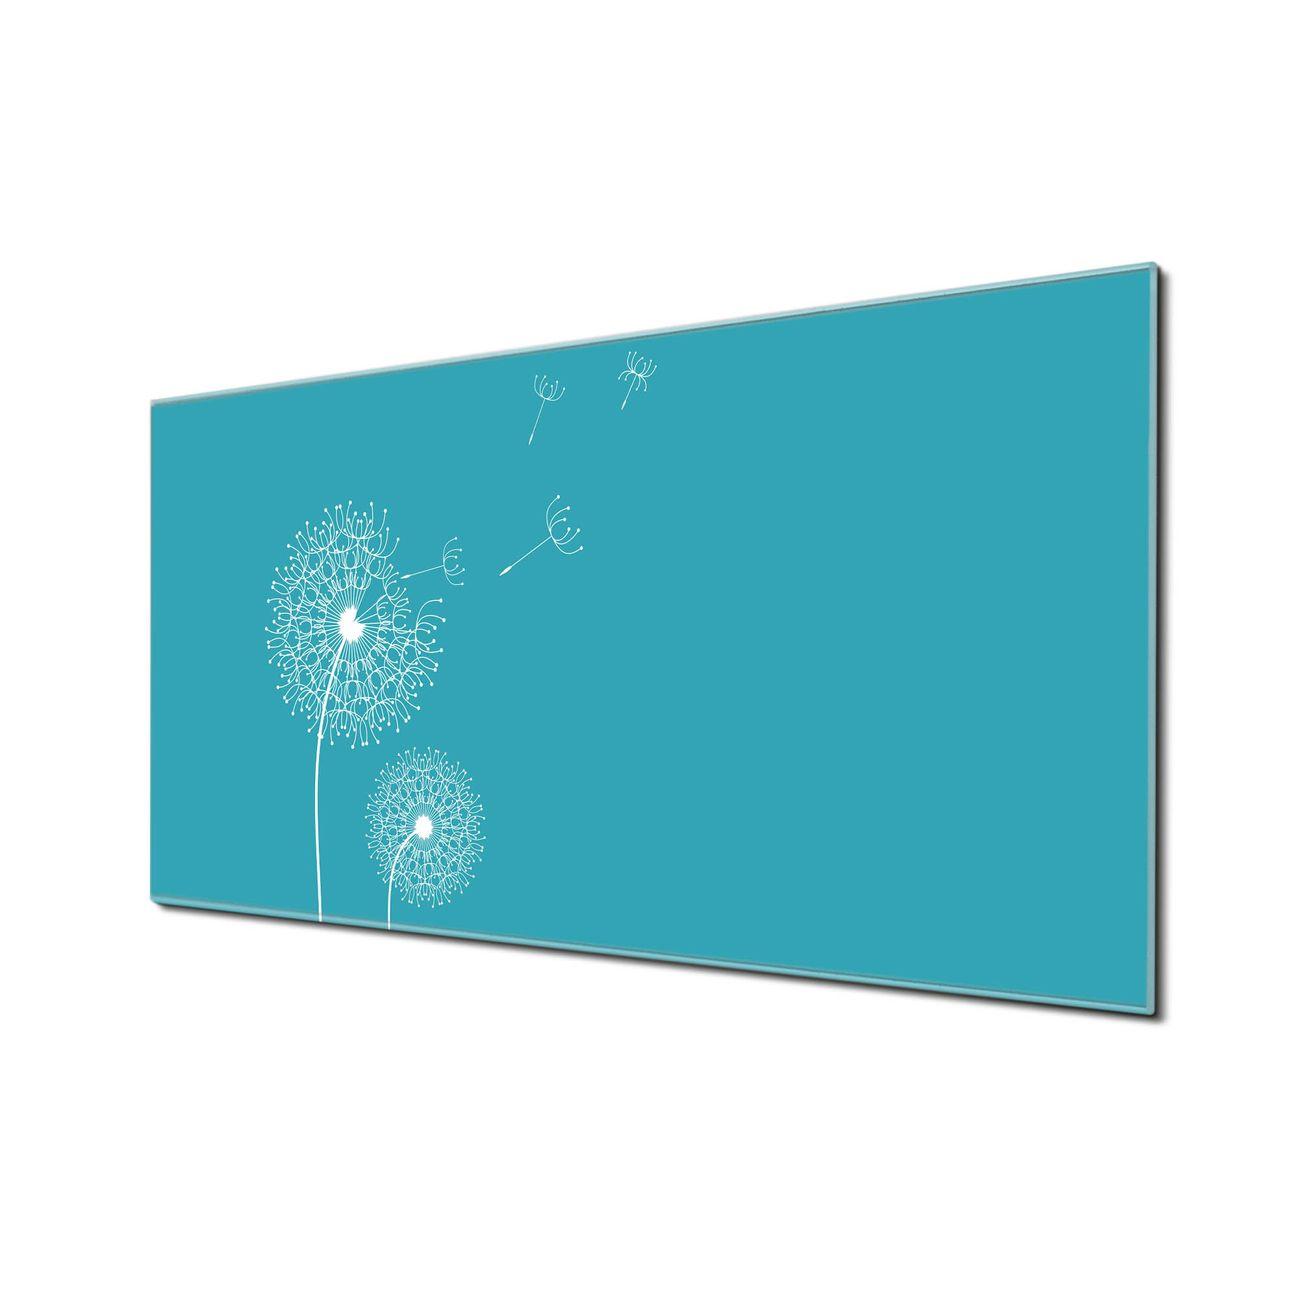 Küchenrückwand Glas Motiv Pusteblume 4